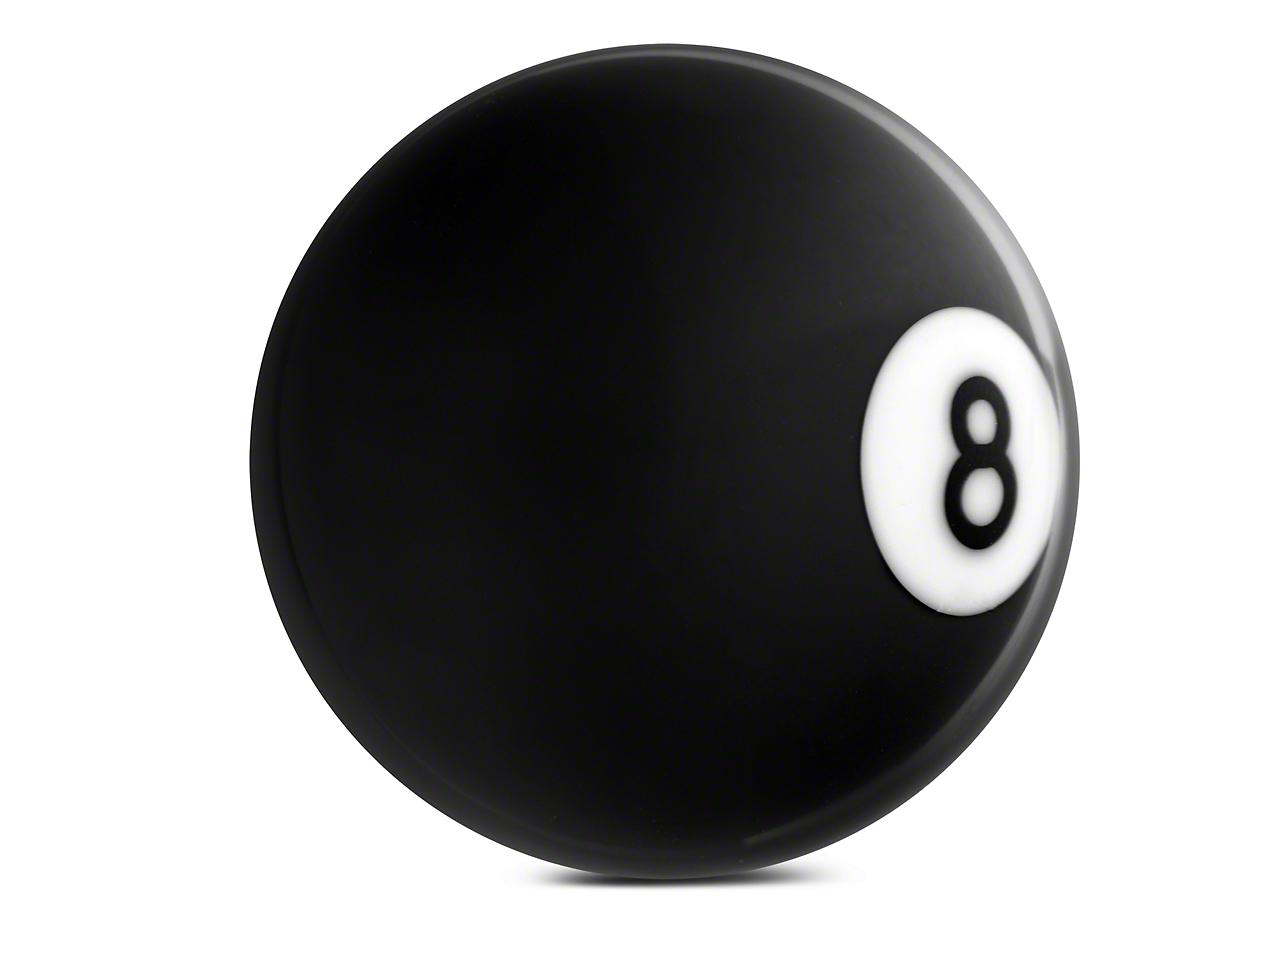 8 Ball Billiard Pool Custom Shift Knob (87-14 Wrangler YJ, TJ & JK)